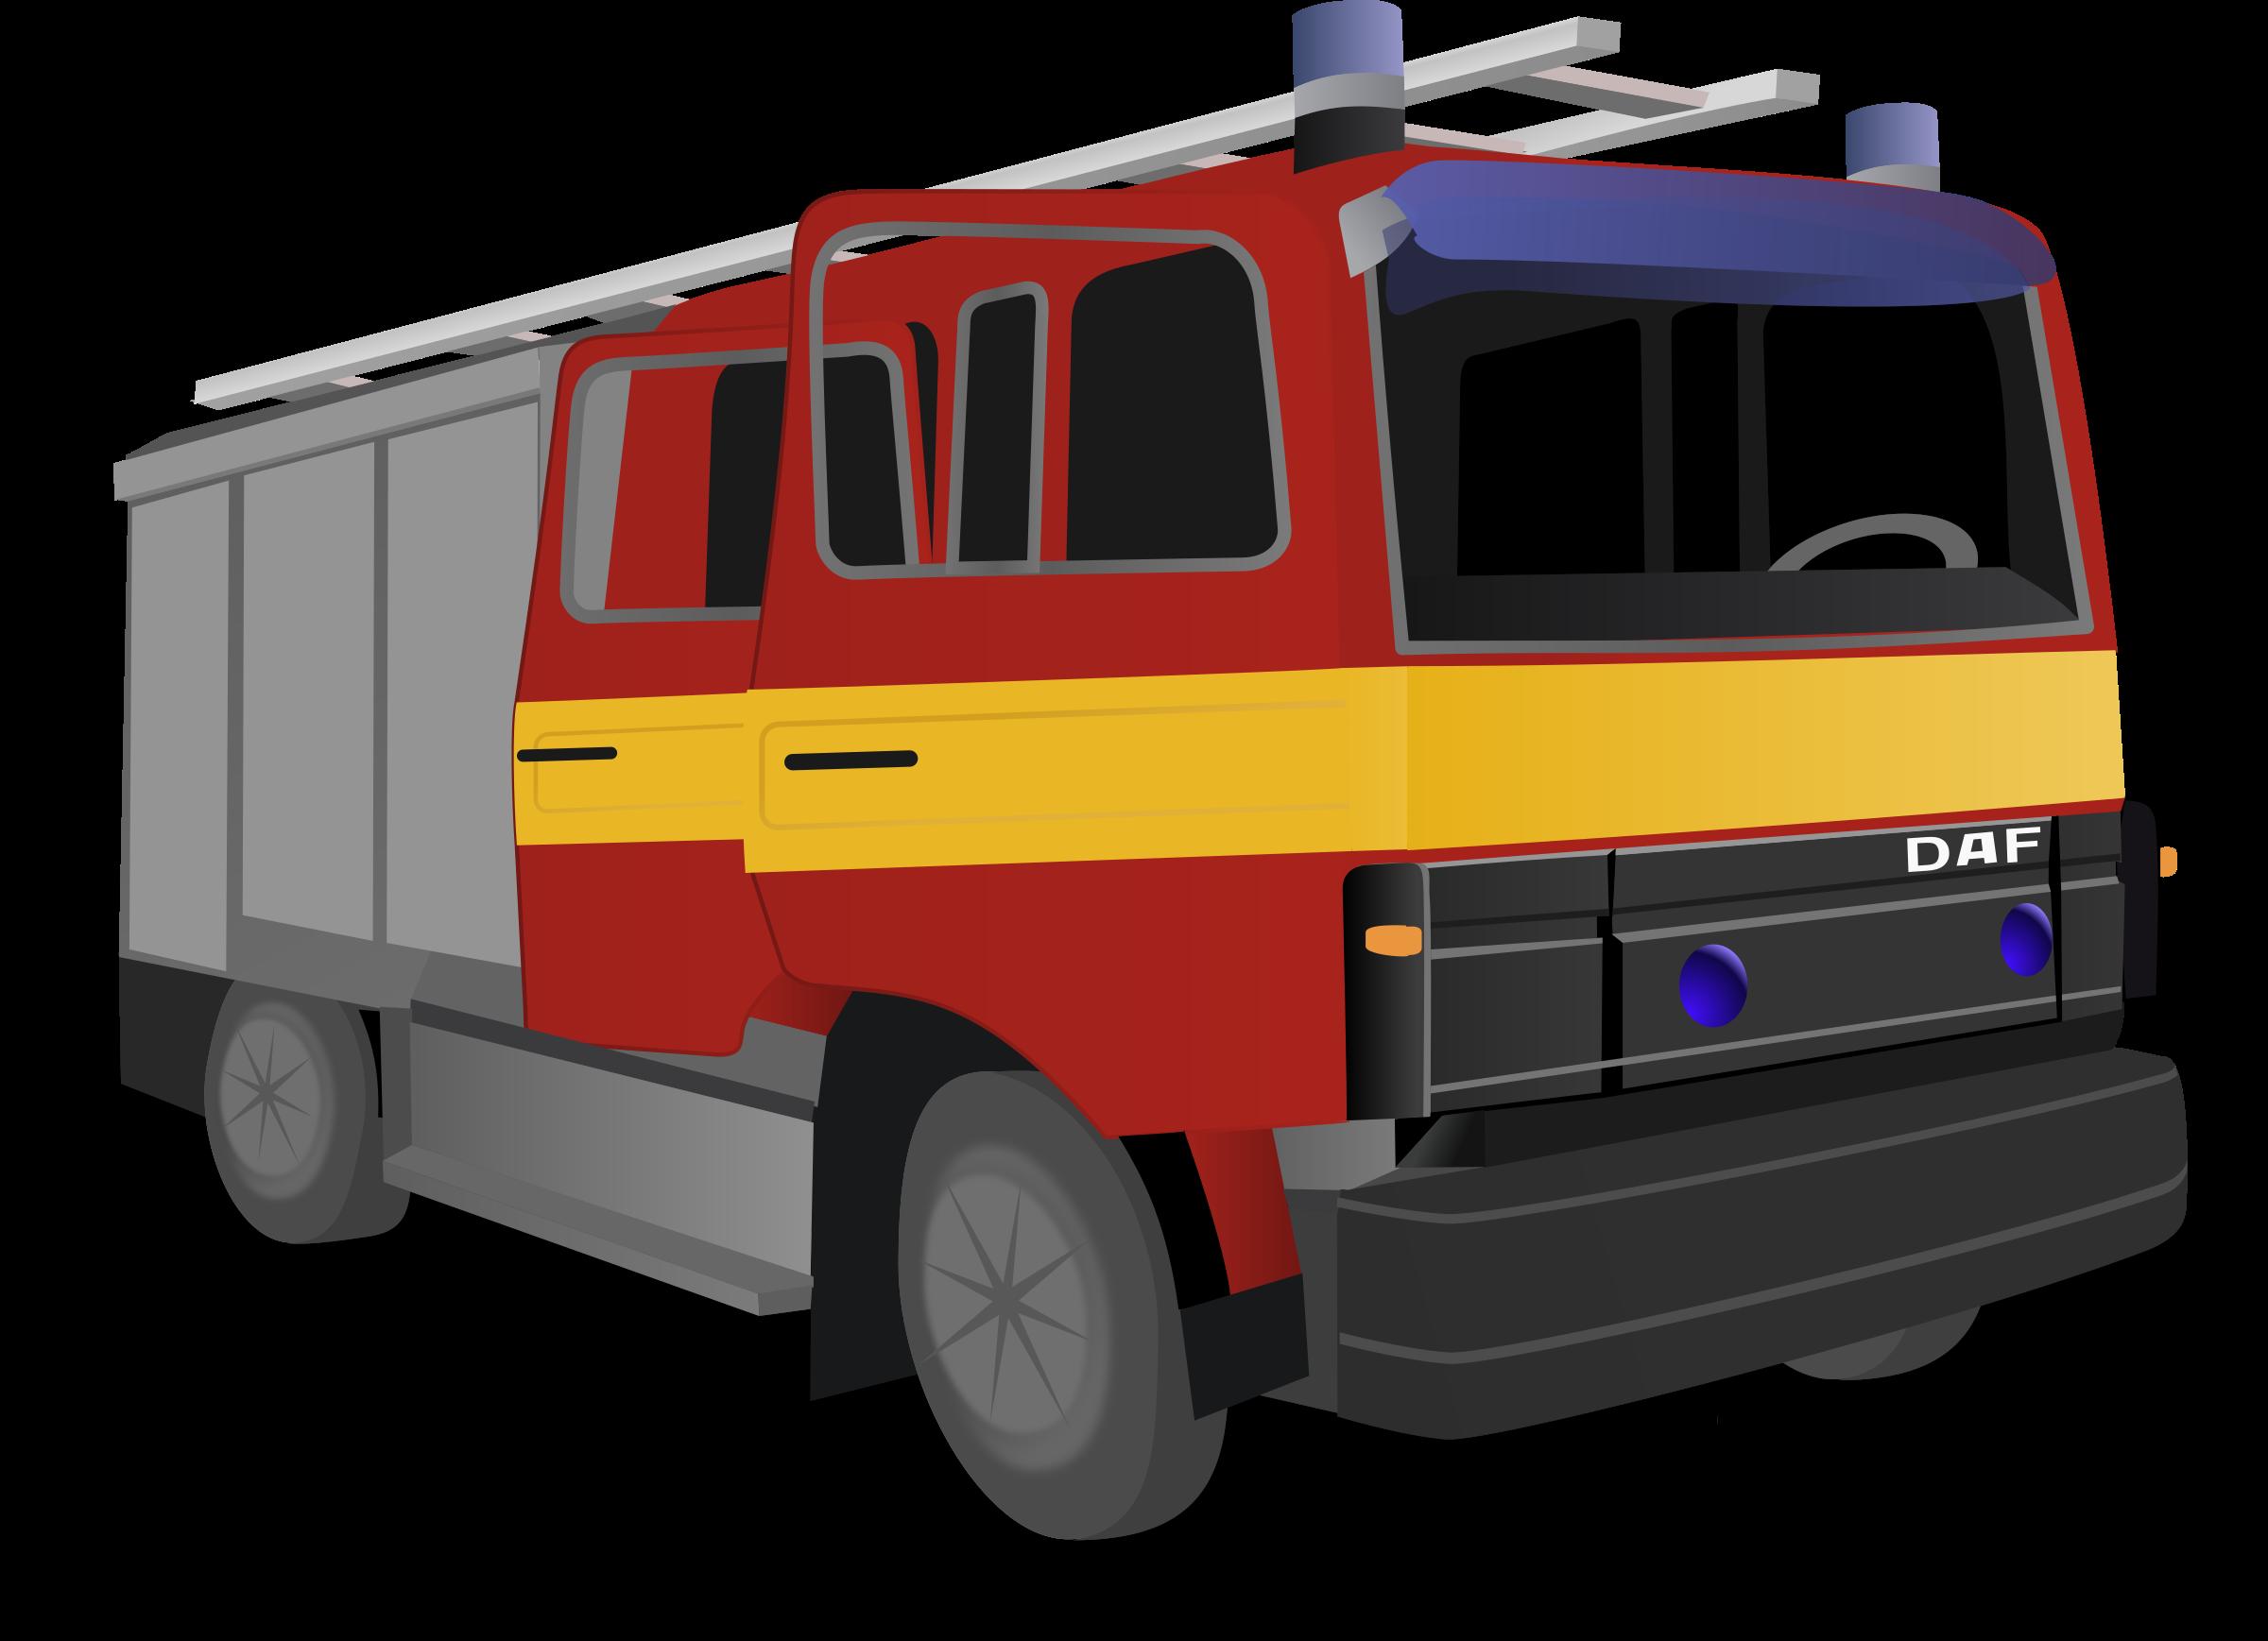 Firetruck clipart van fire. Truck big image png